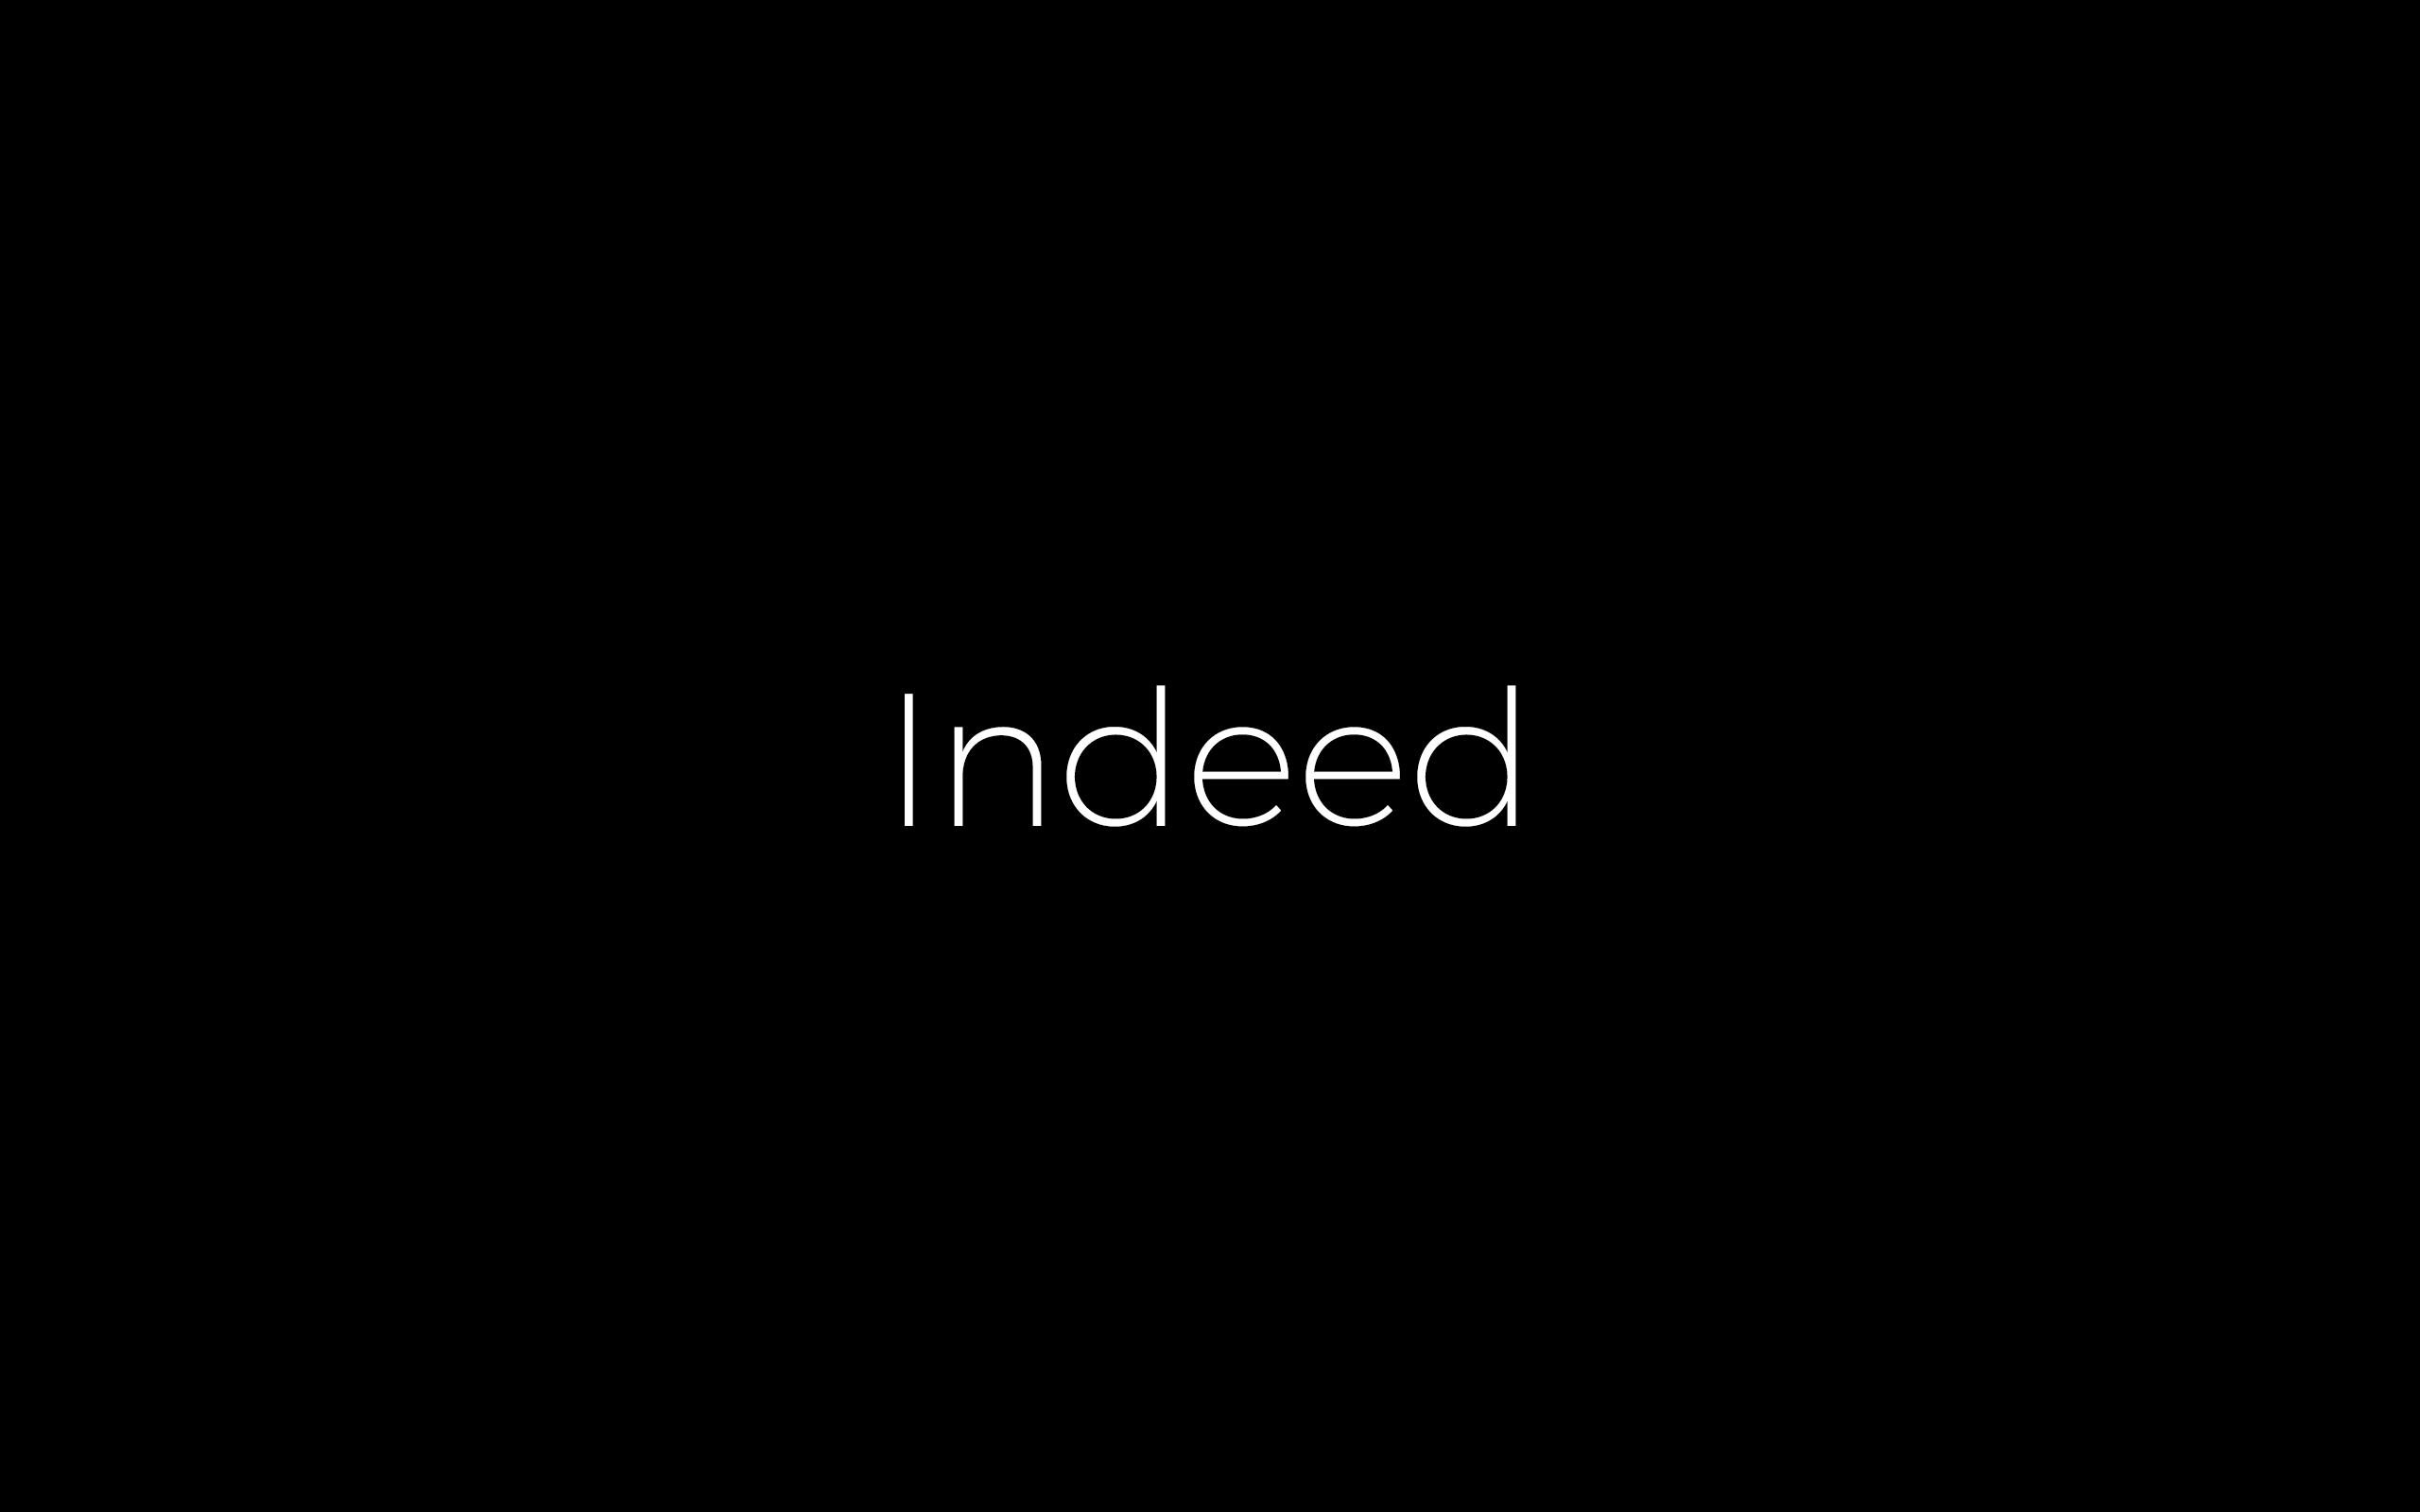 Designers Favorite Typefaces Inside Design Blog